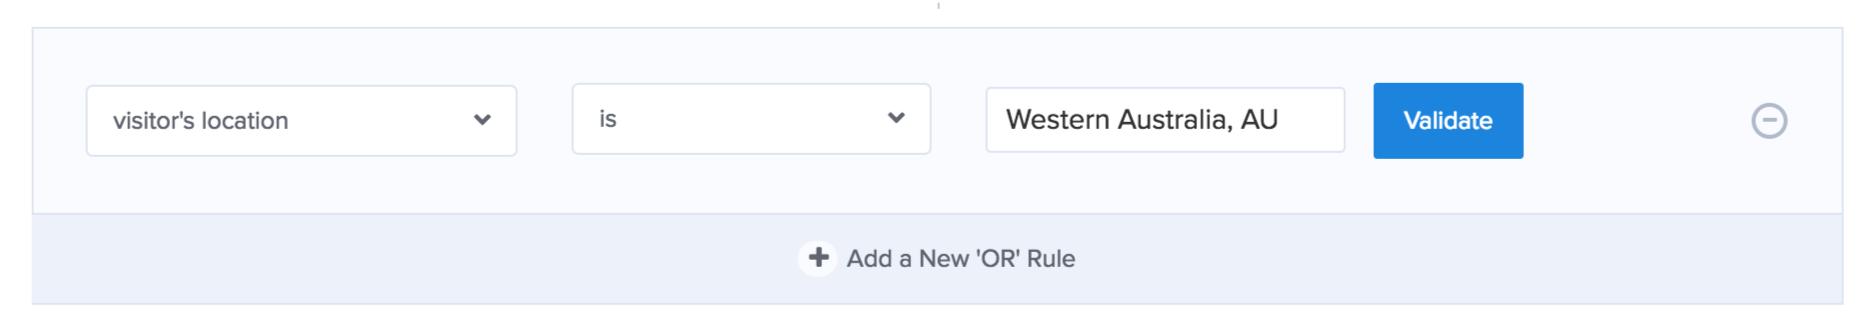 Inbound Marketing OptinMonster geolocation to qualify visitors.